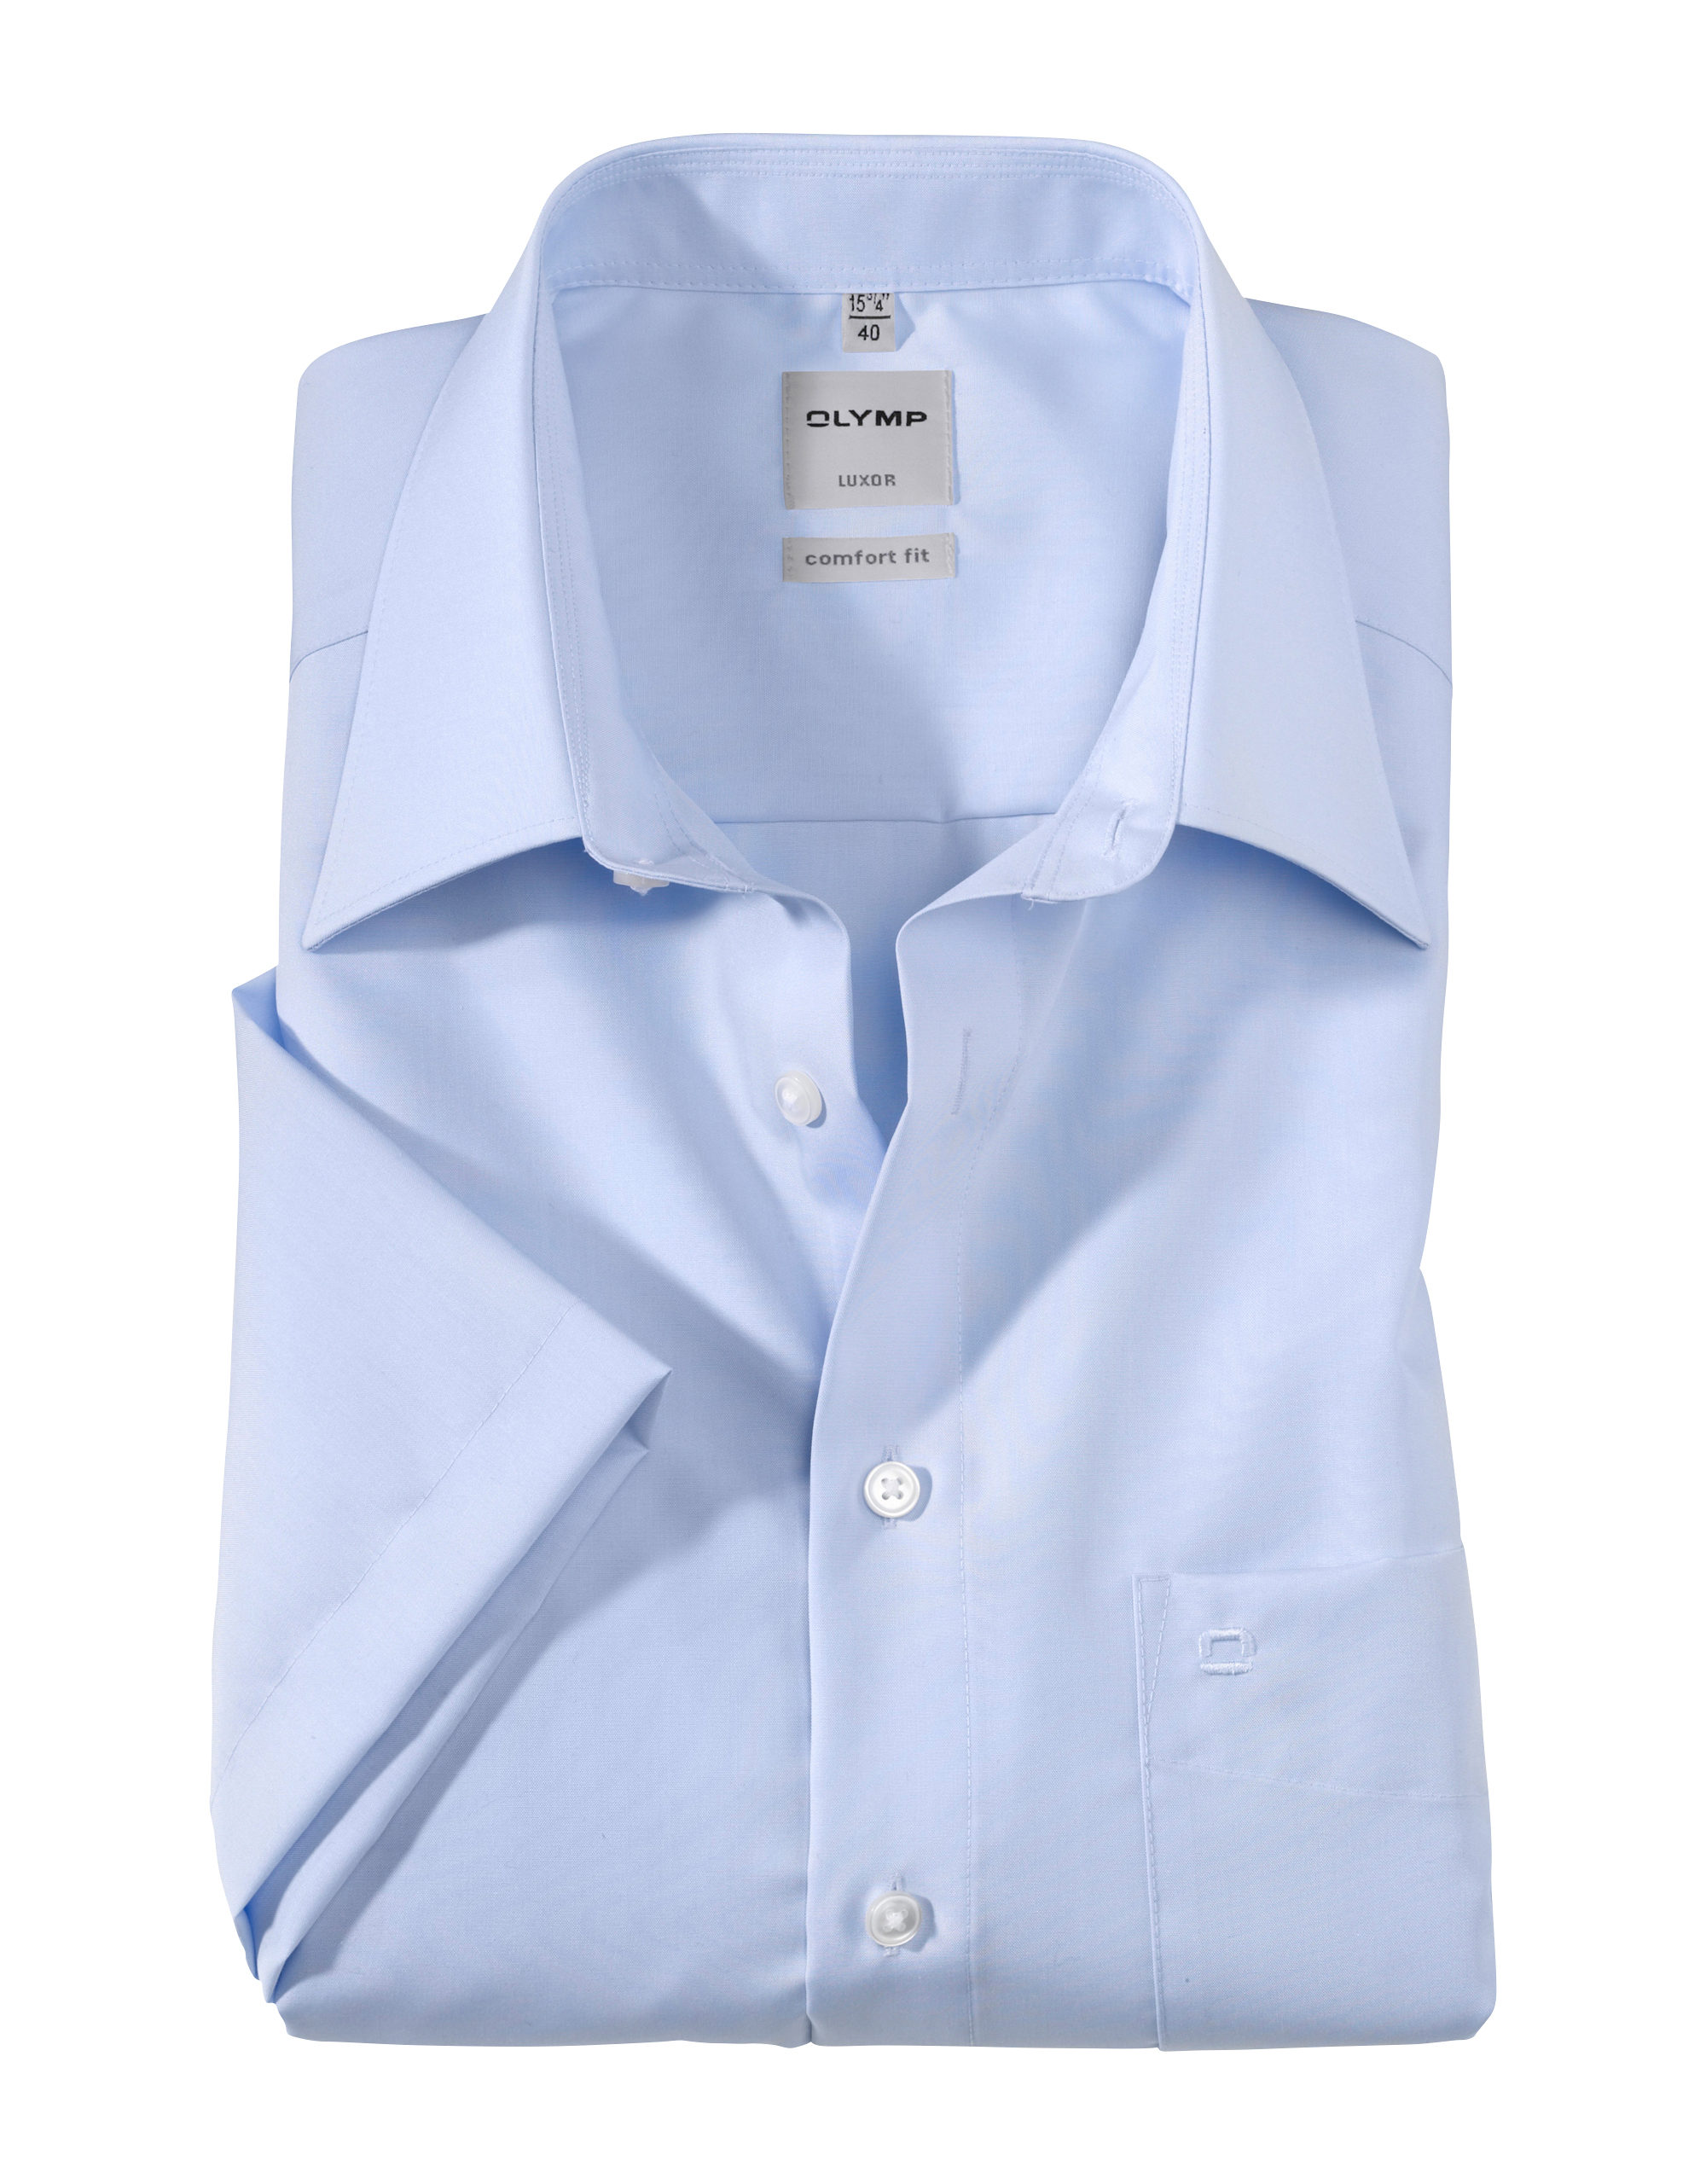 OLYMP Luxor Halbarmhemd, comfort fit, Kent, Blau, 49 | Bekleidung > Hemden > Sonstige Hemden | OLYMP